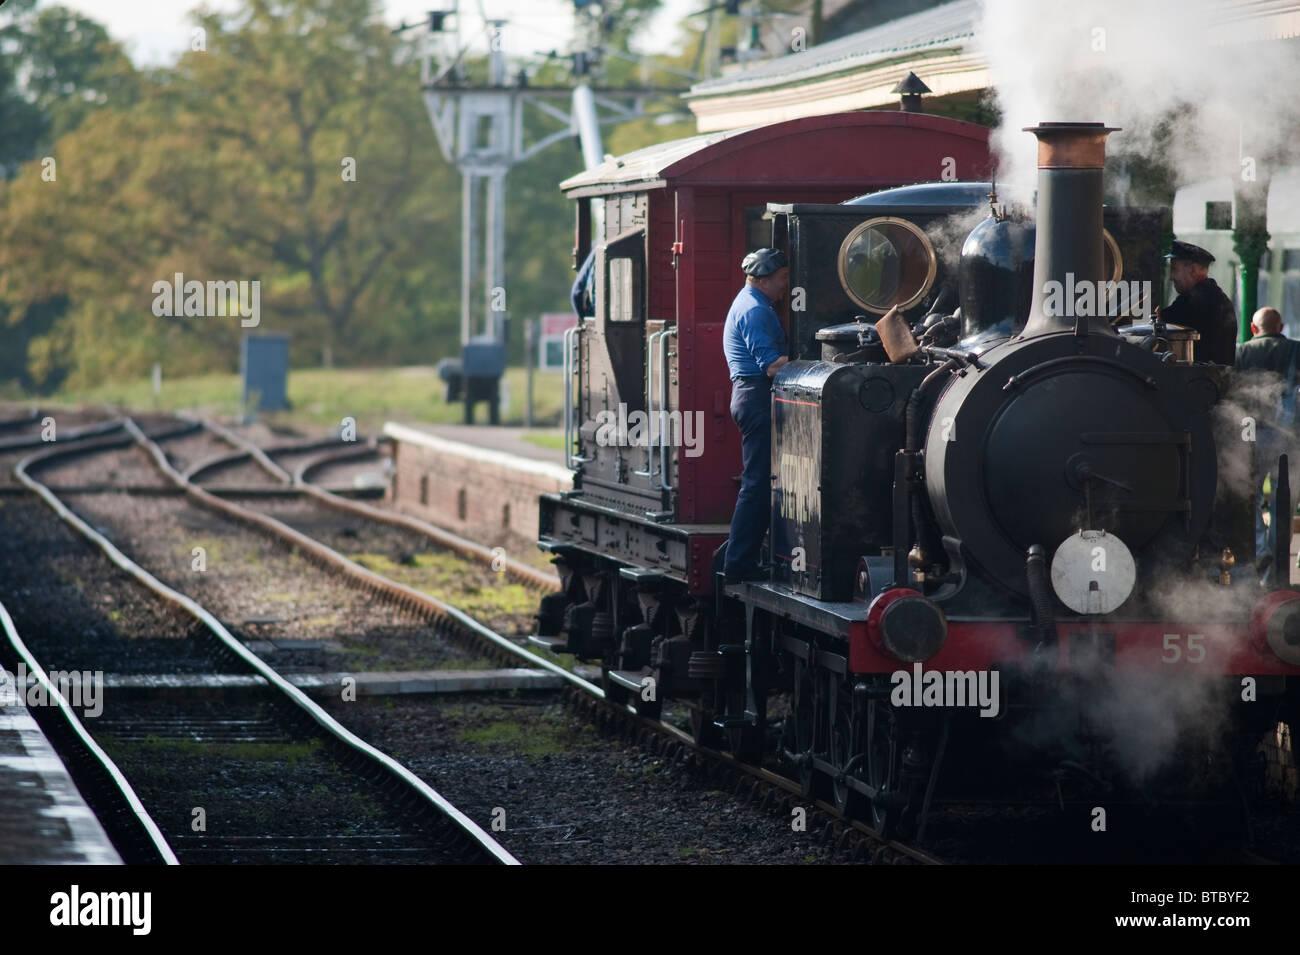 A1X clase locomotora 55 Stepney, Bluebell Railway, Sussex, Inglaterra Foto de stock